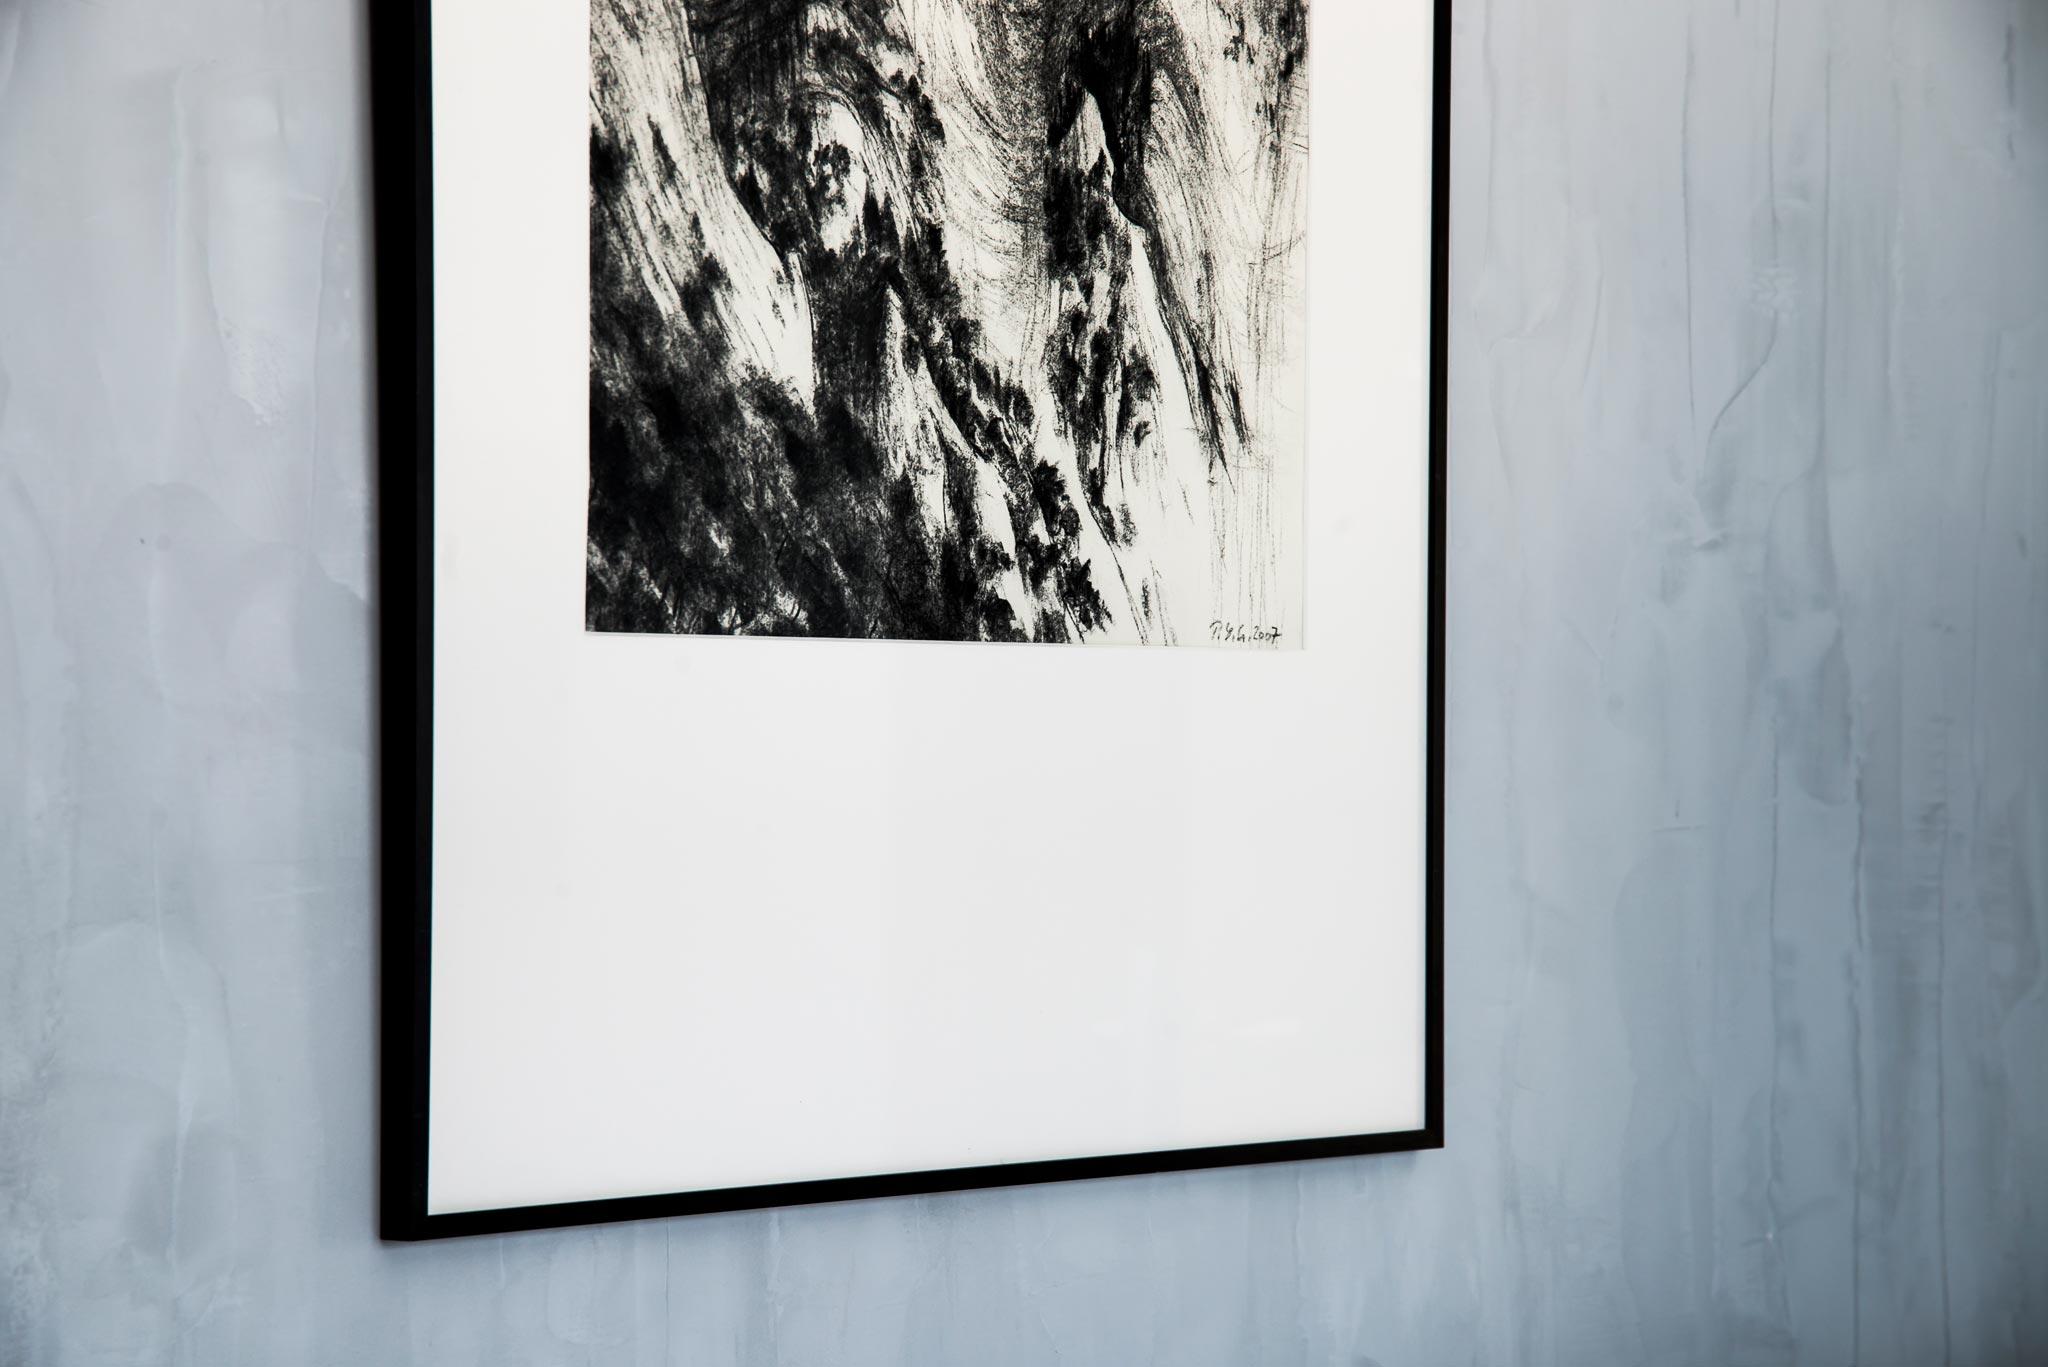 ES BainSaillon 6060 art hor 17 01 038 - ...Suite des bains de saillon